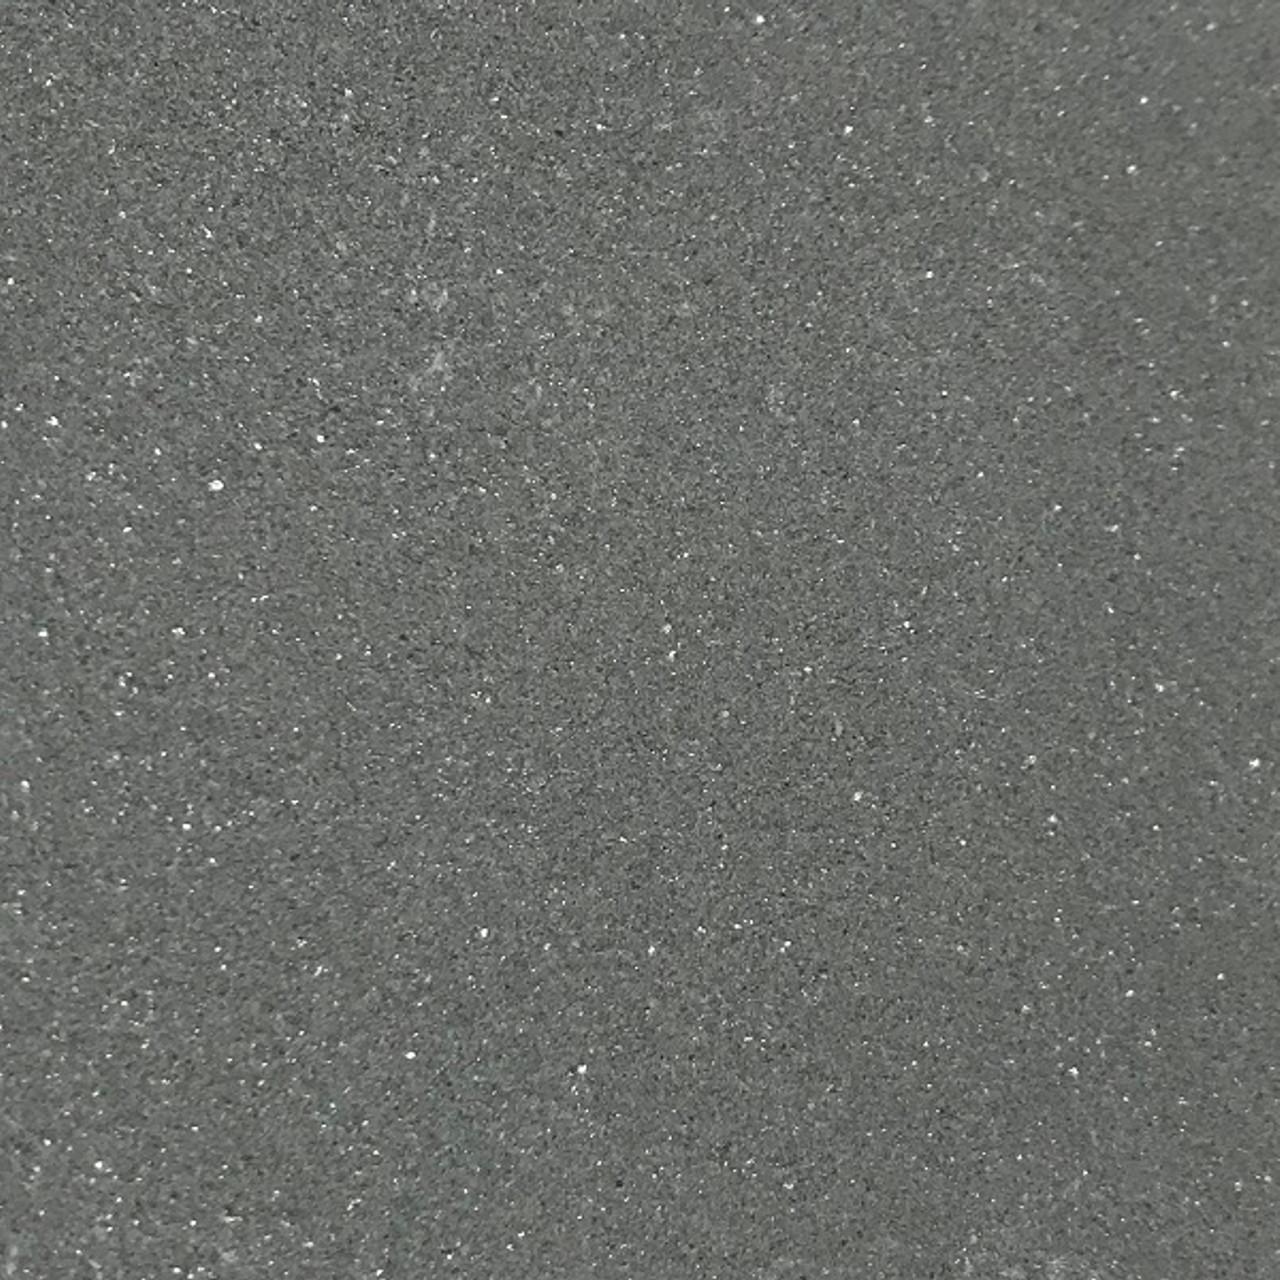 Bluestone brushed finish. Similar to a leather texture.